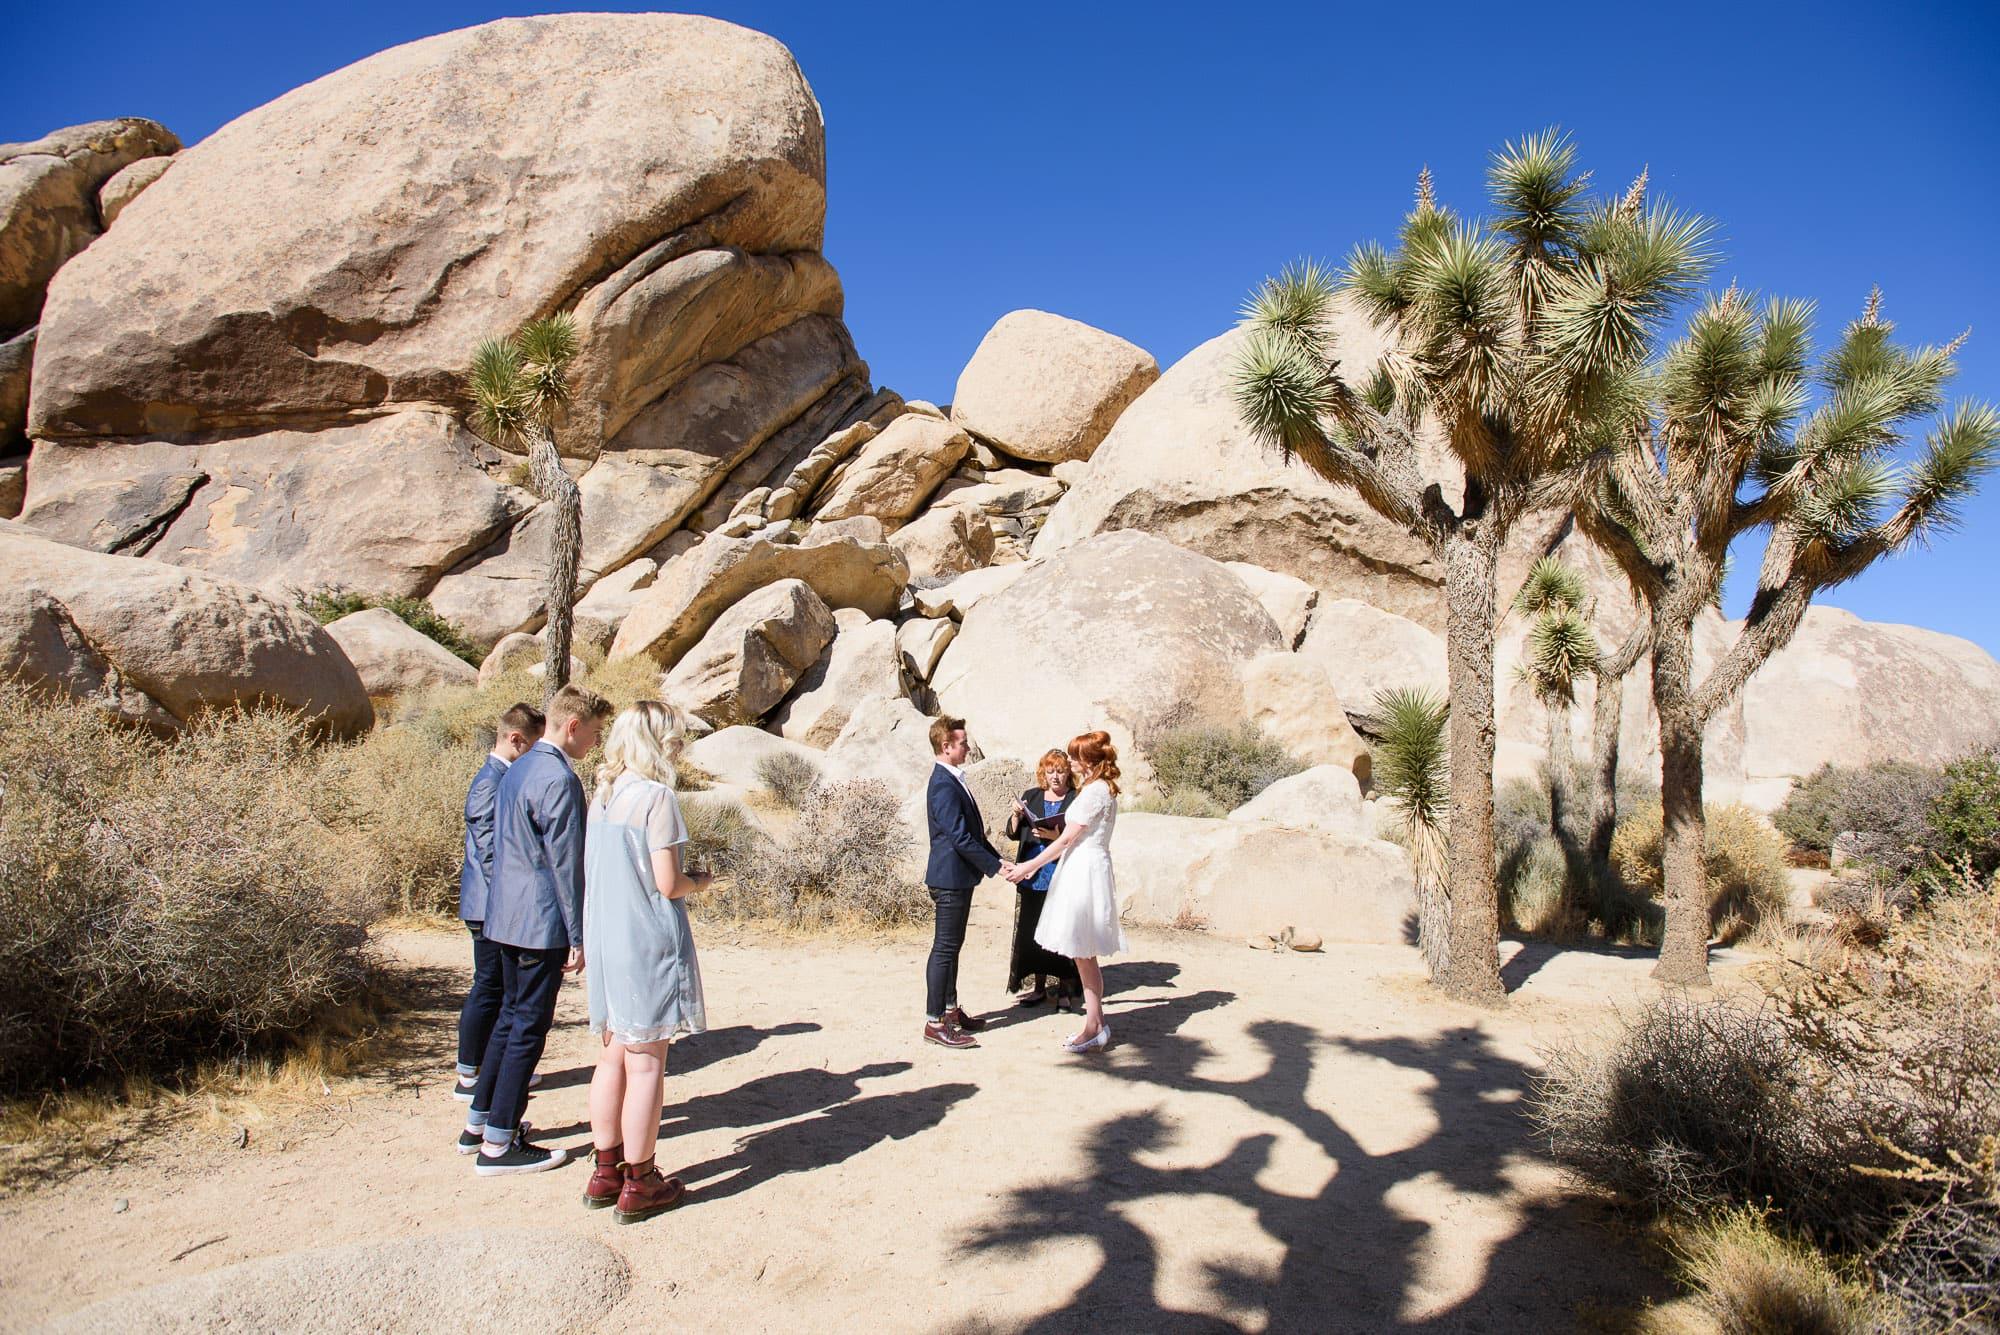 012_Alan_and_Heidi_Joshua_Tree_Destination_Wedding